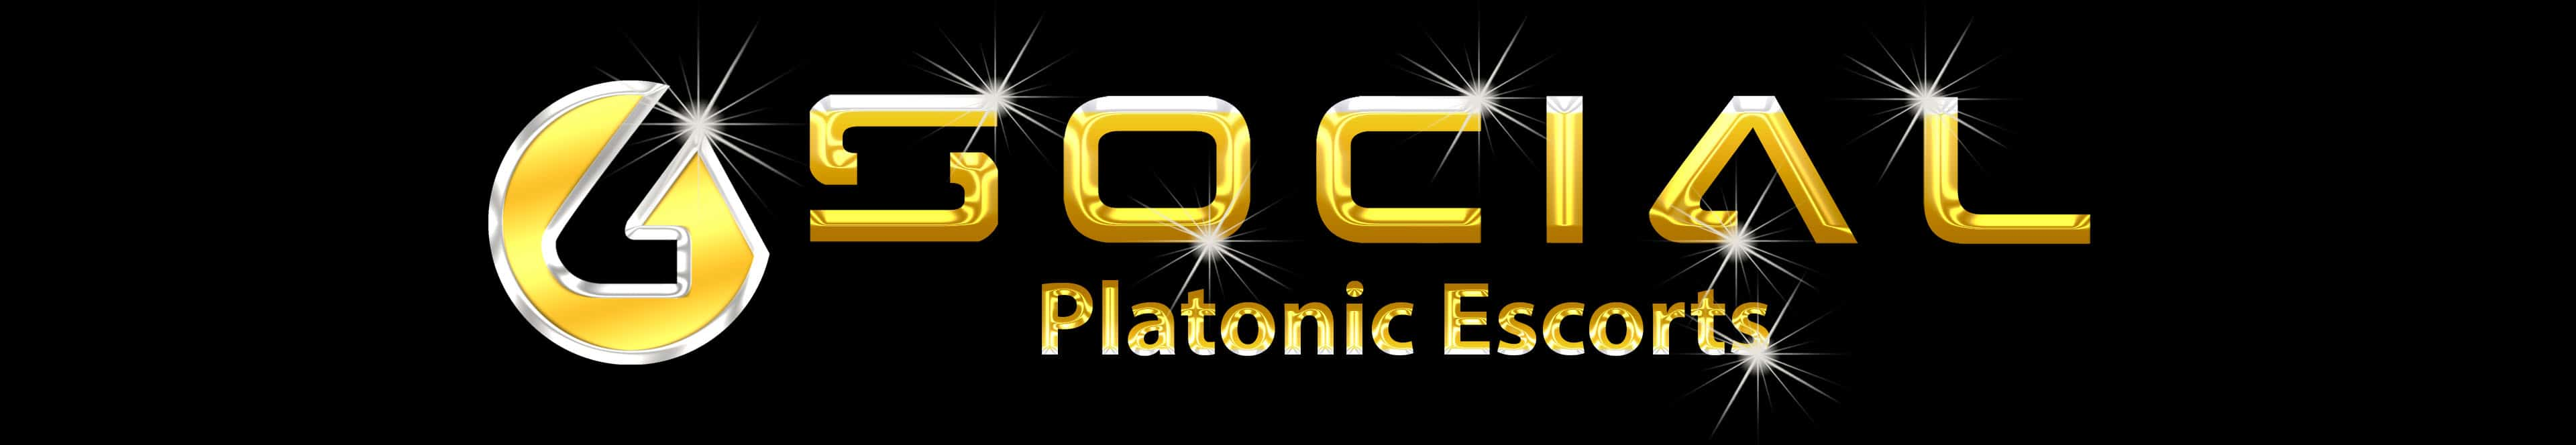 Logo-Division-Absolu-Social-Platonic-Escorts-Absolu-Copine-Montreal-EN-4K